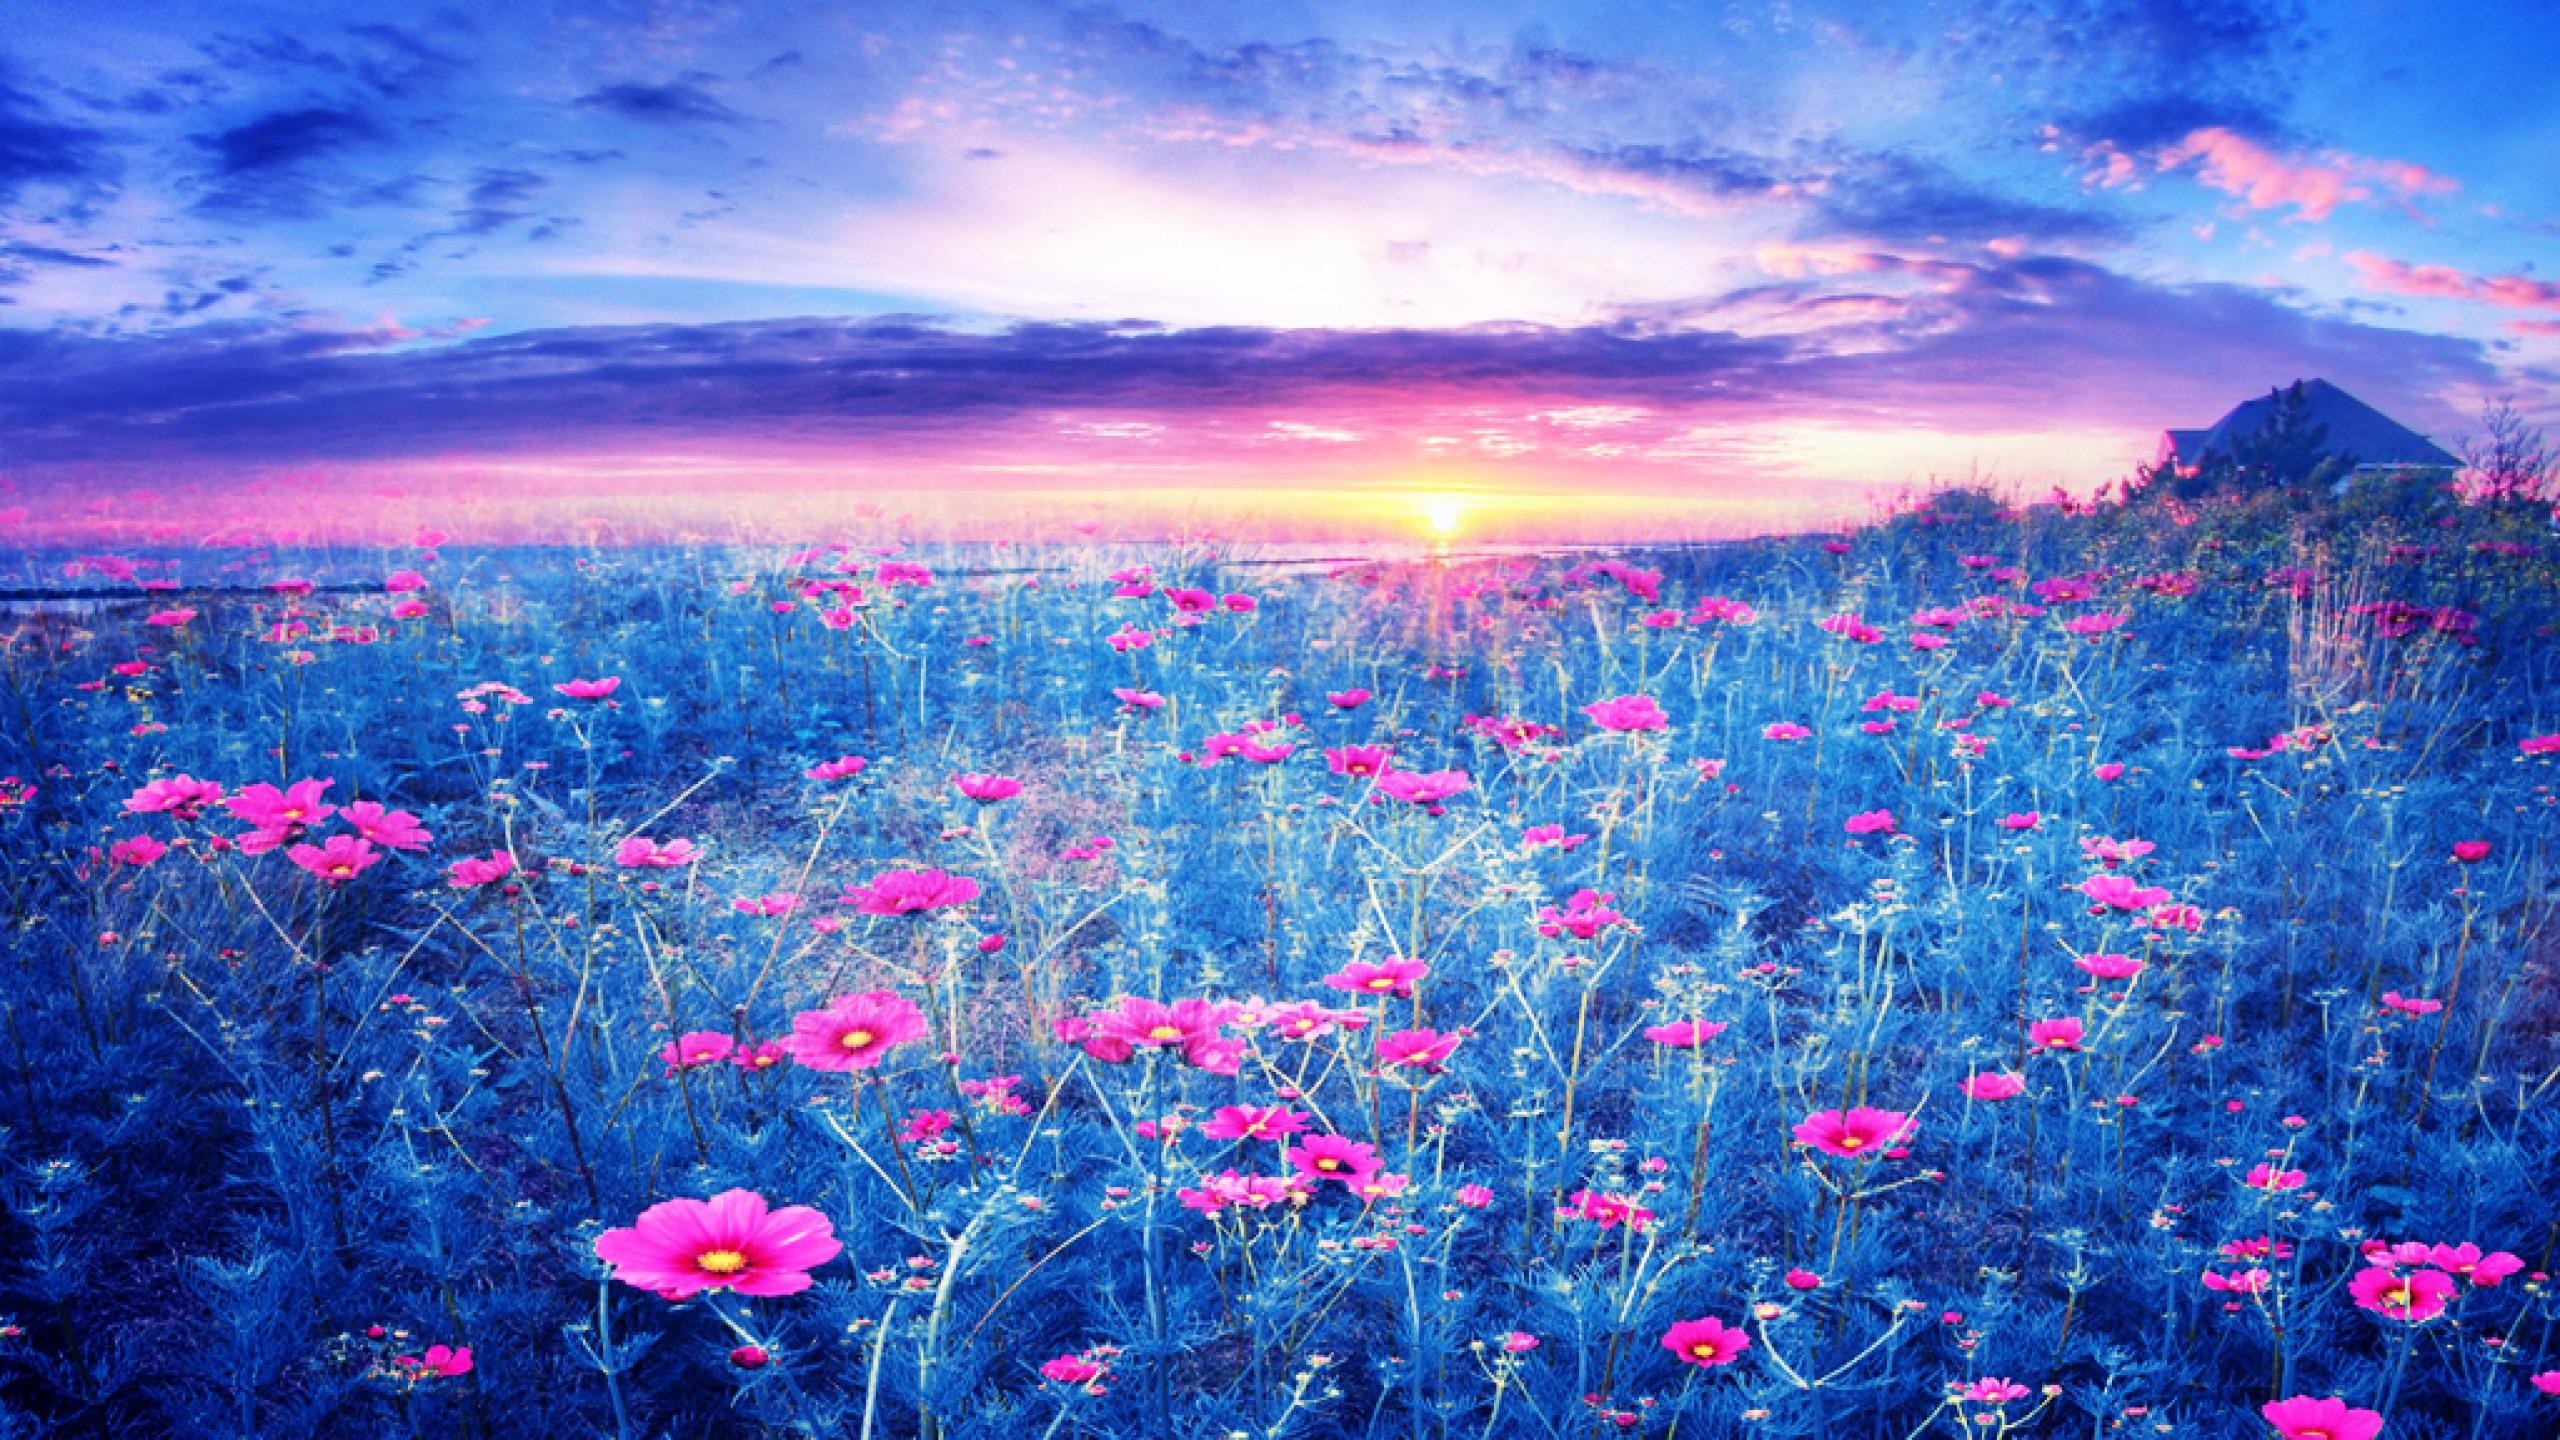 Image: http://abstract.desktopnexus.com/get/1313162?t=m9lre6eocjbpci5b2hafse72o754aa2a95e36d2